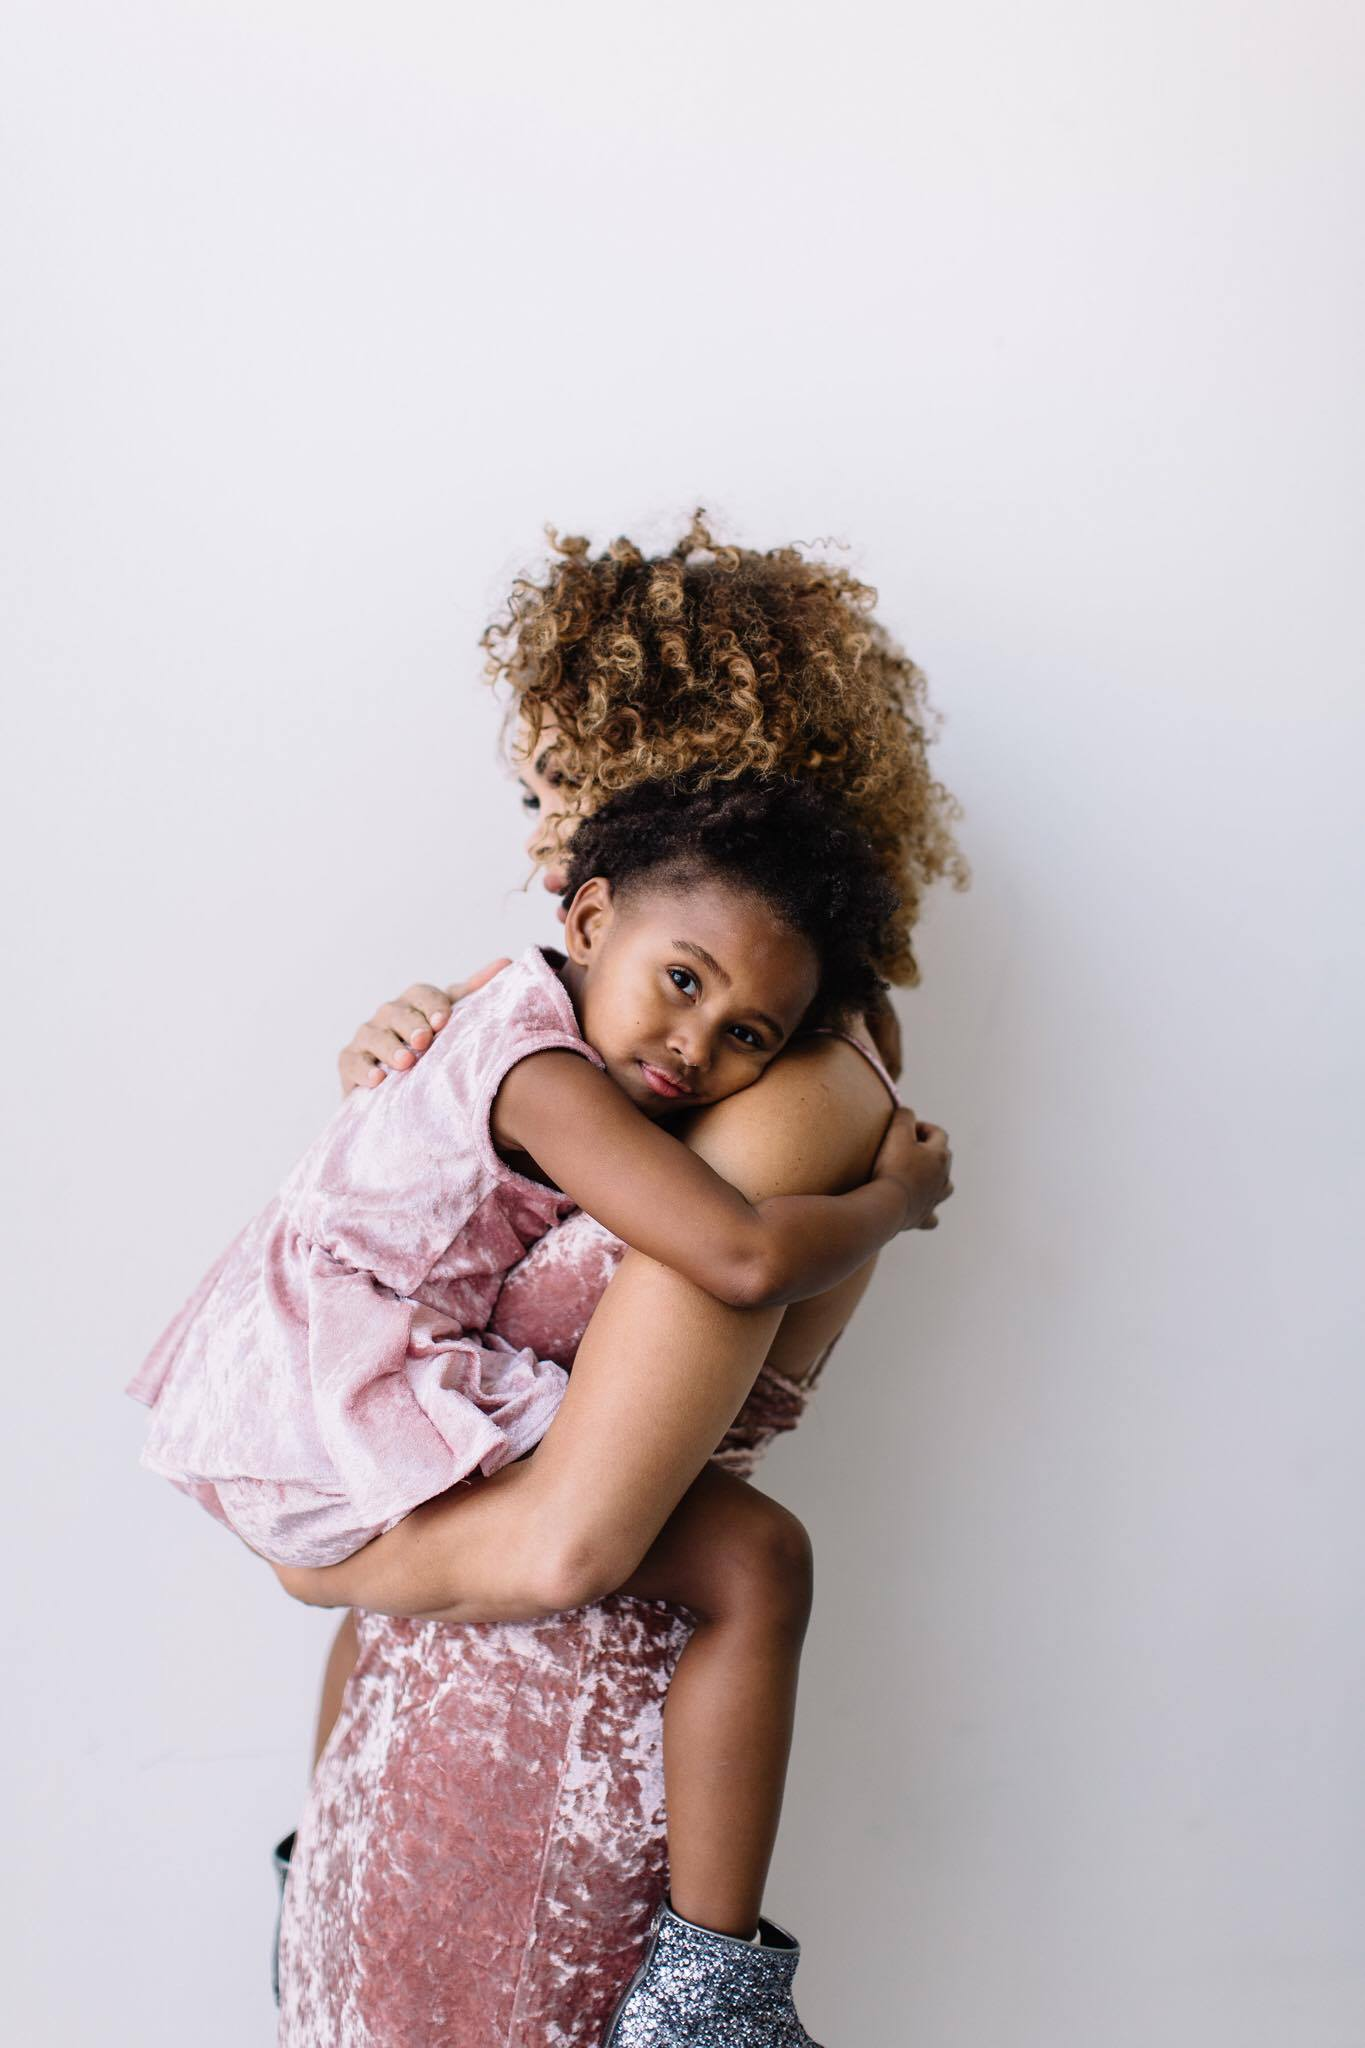 My Wish for You by popular SLC mommy blogger Destiney of MomCrushMonday